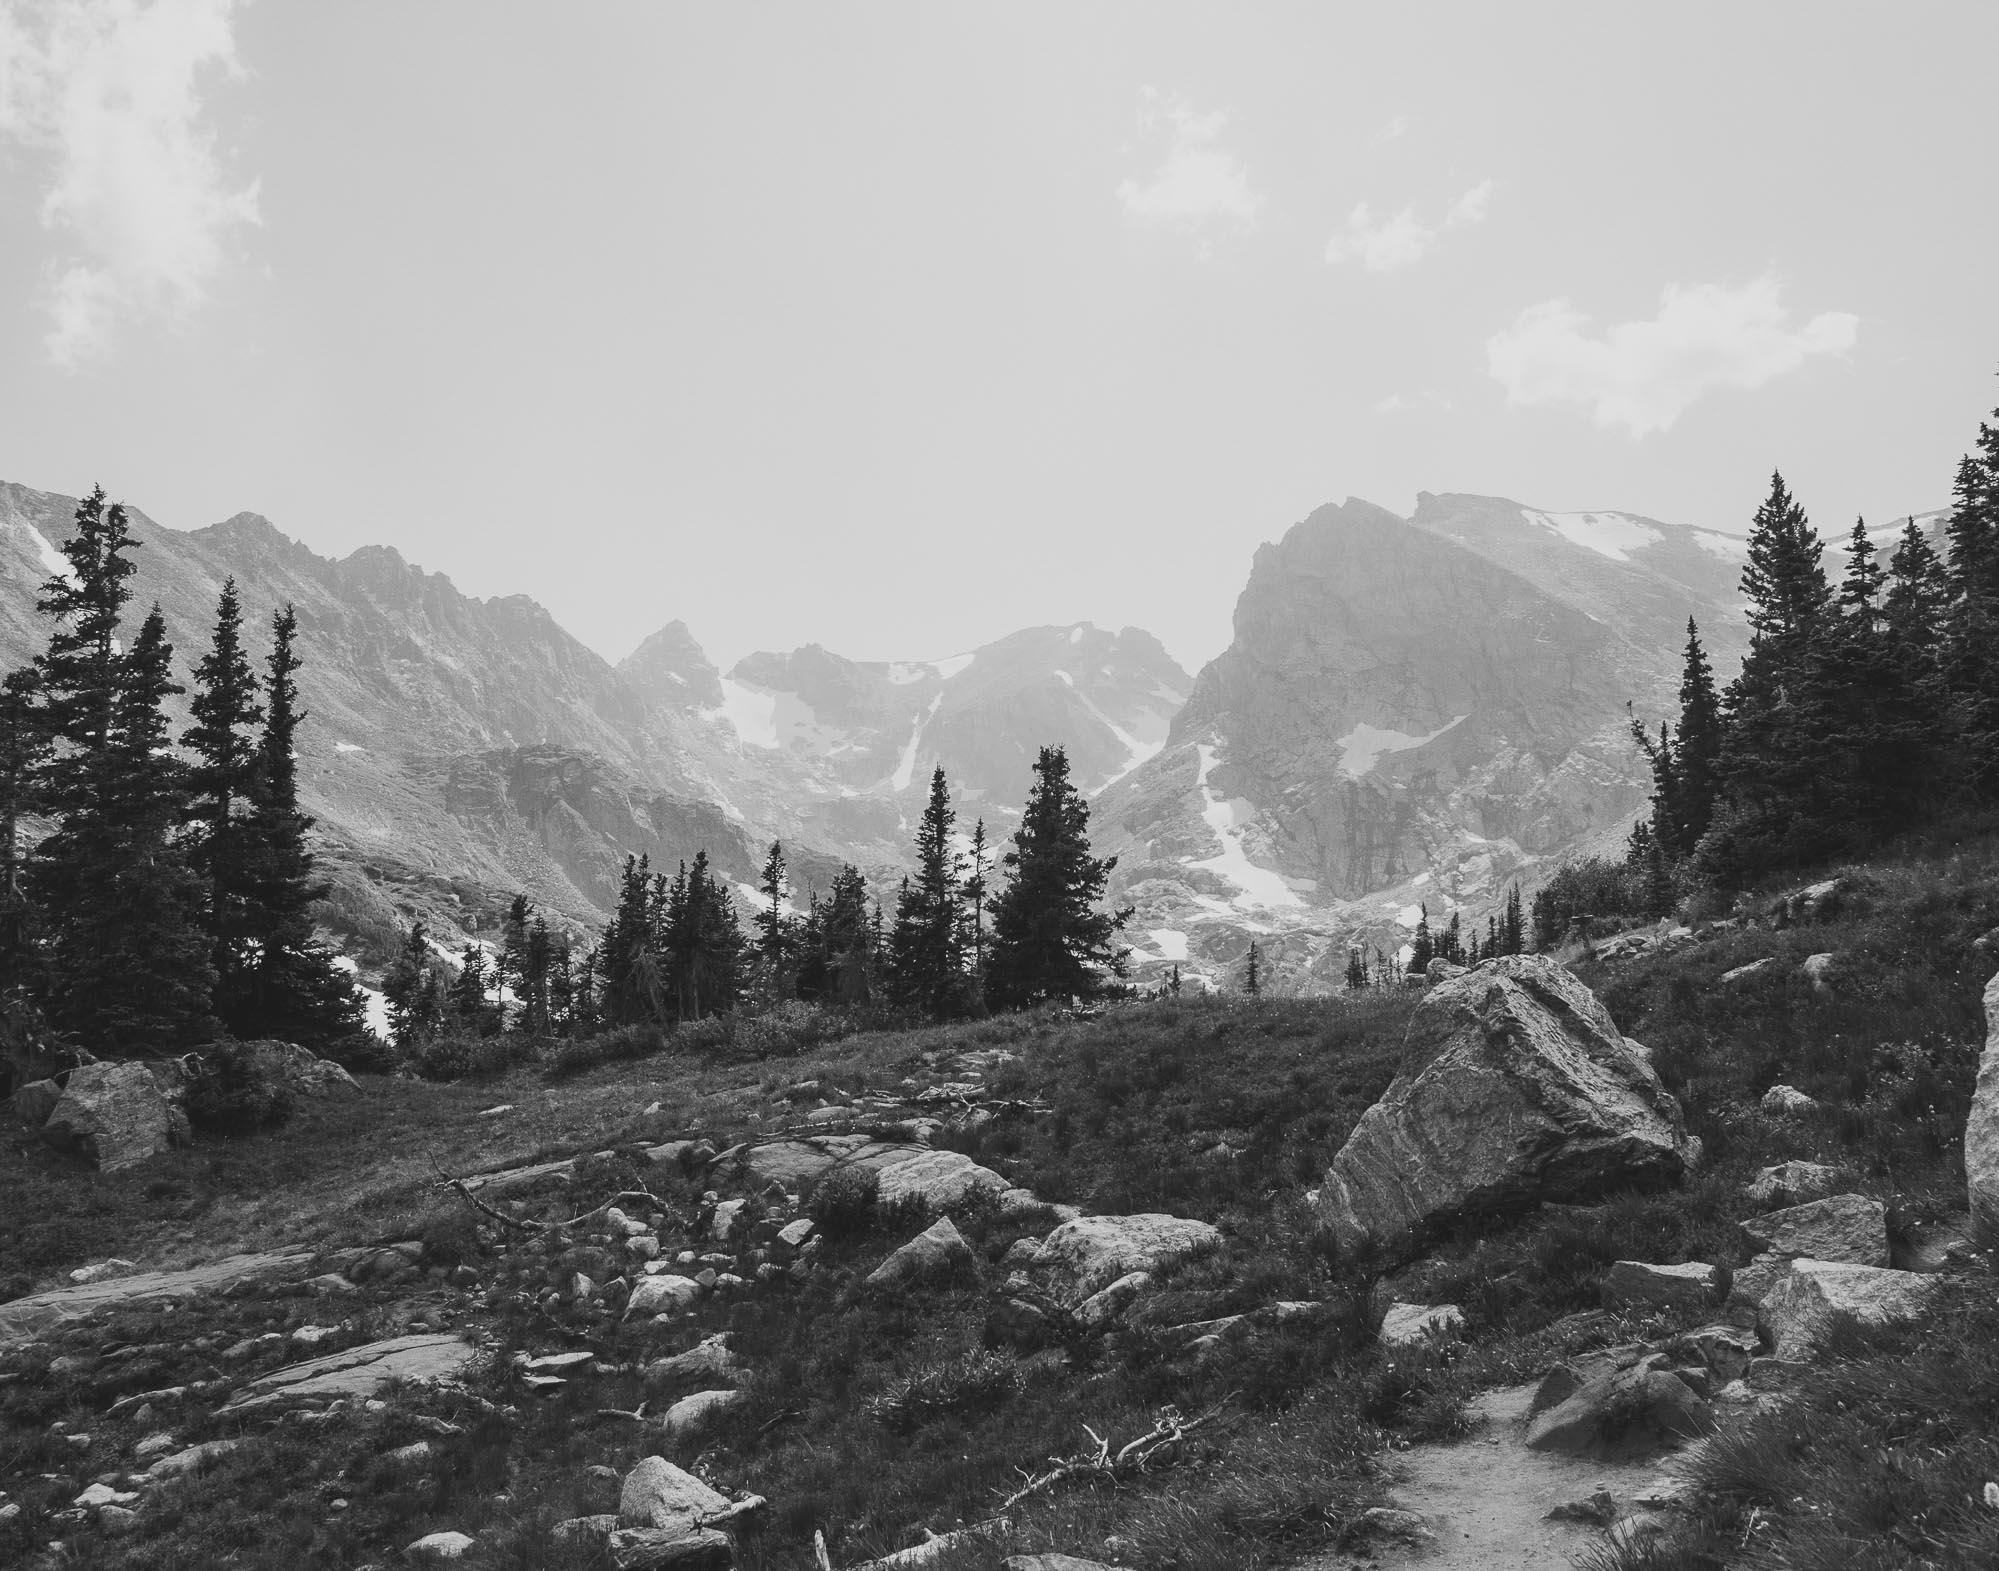 26elopement-photographer-colorado-lake_isabelle_colorado_glacier_095bw.jpg